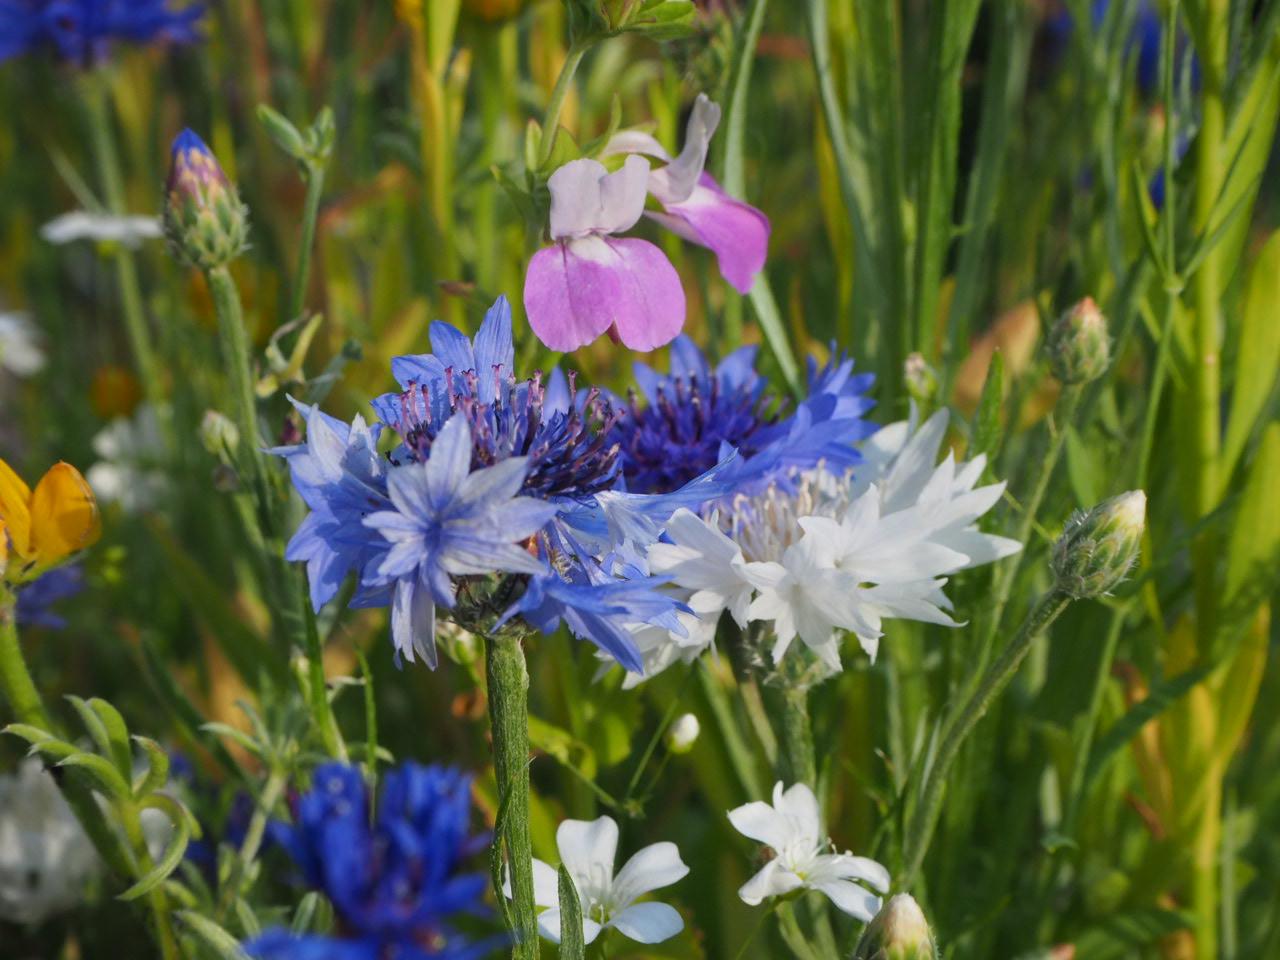 Japanische Blumenwiese in bunt